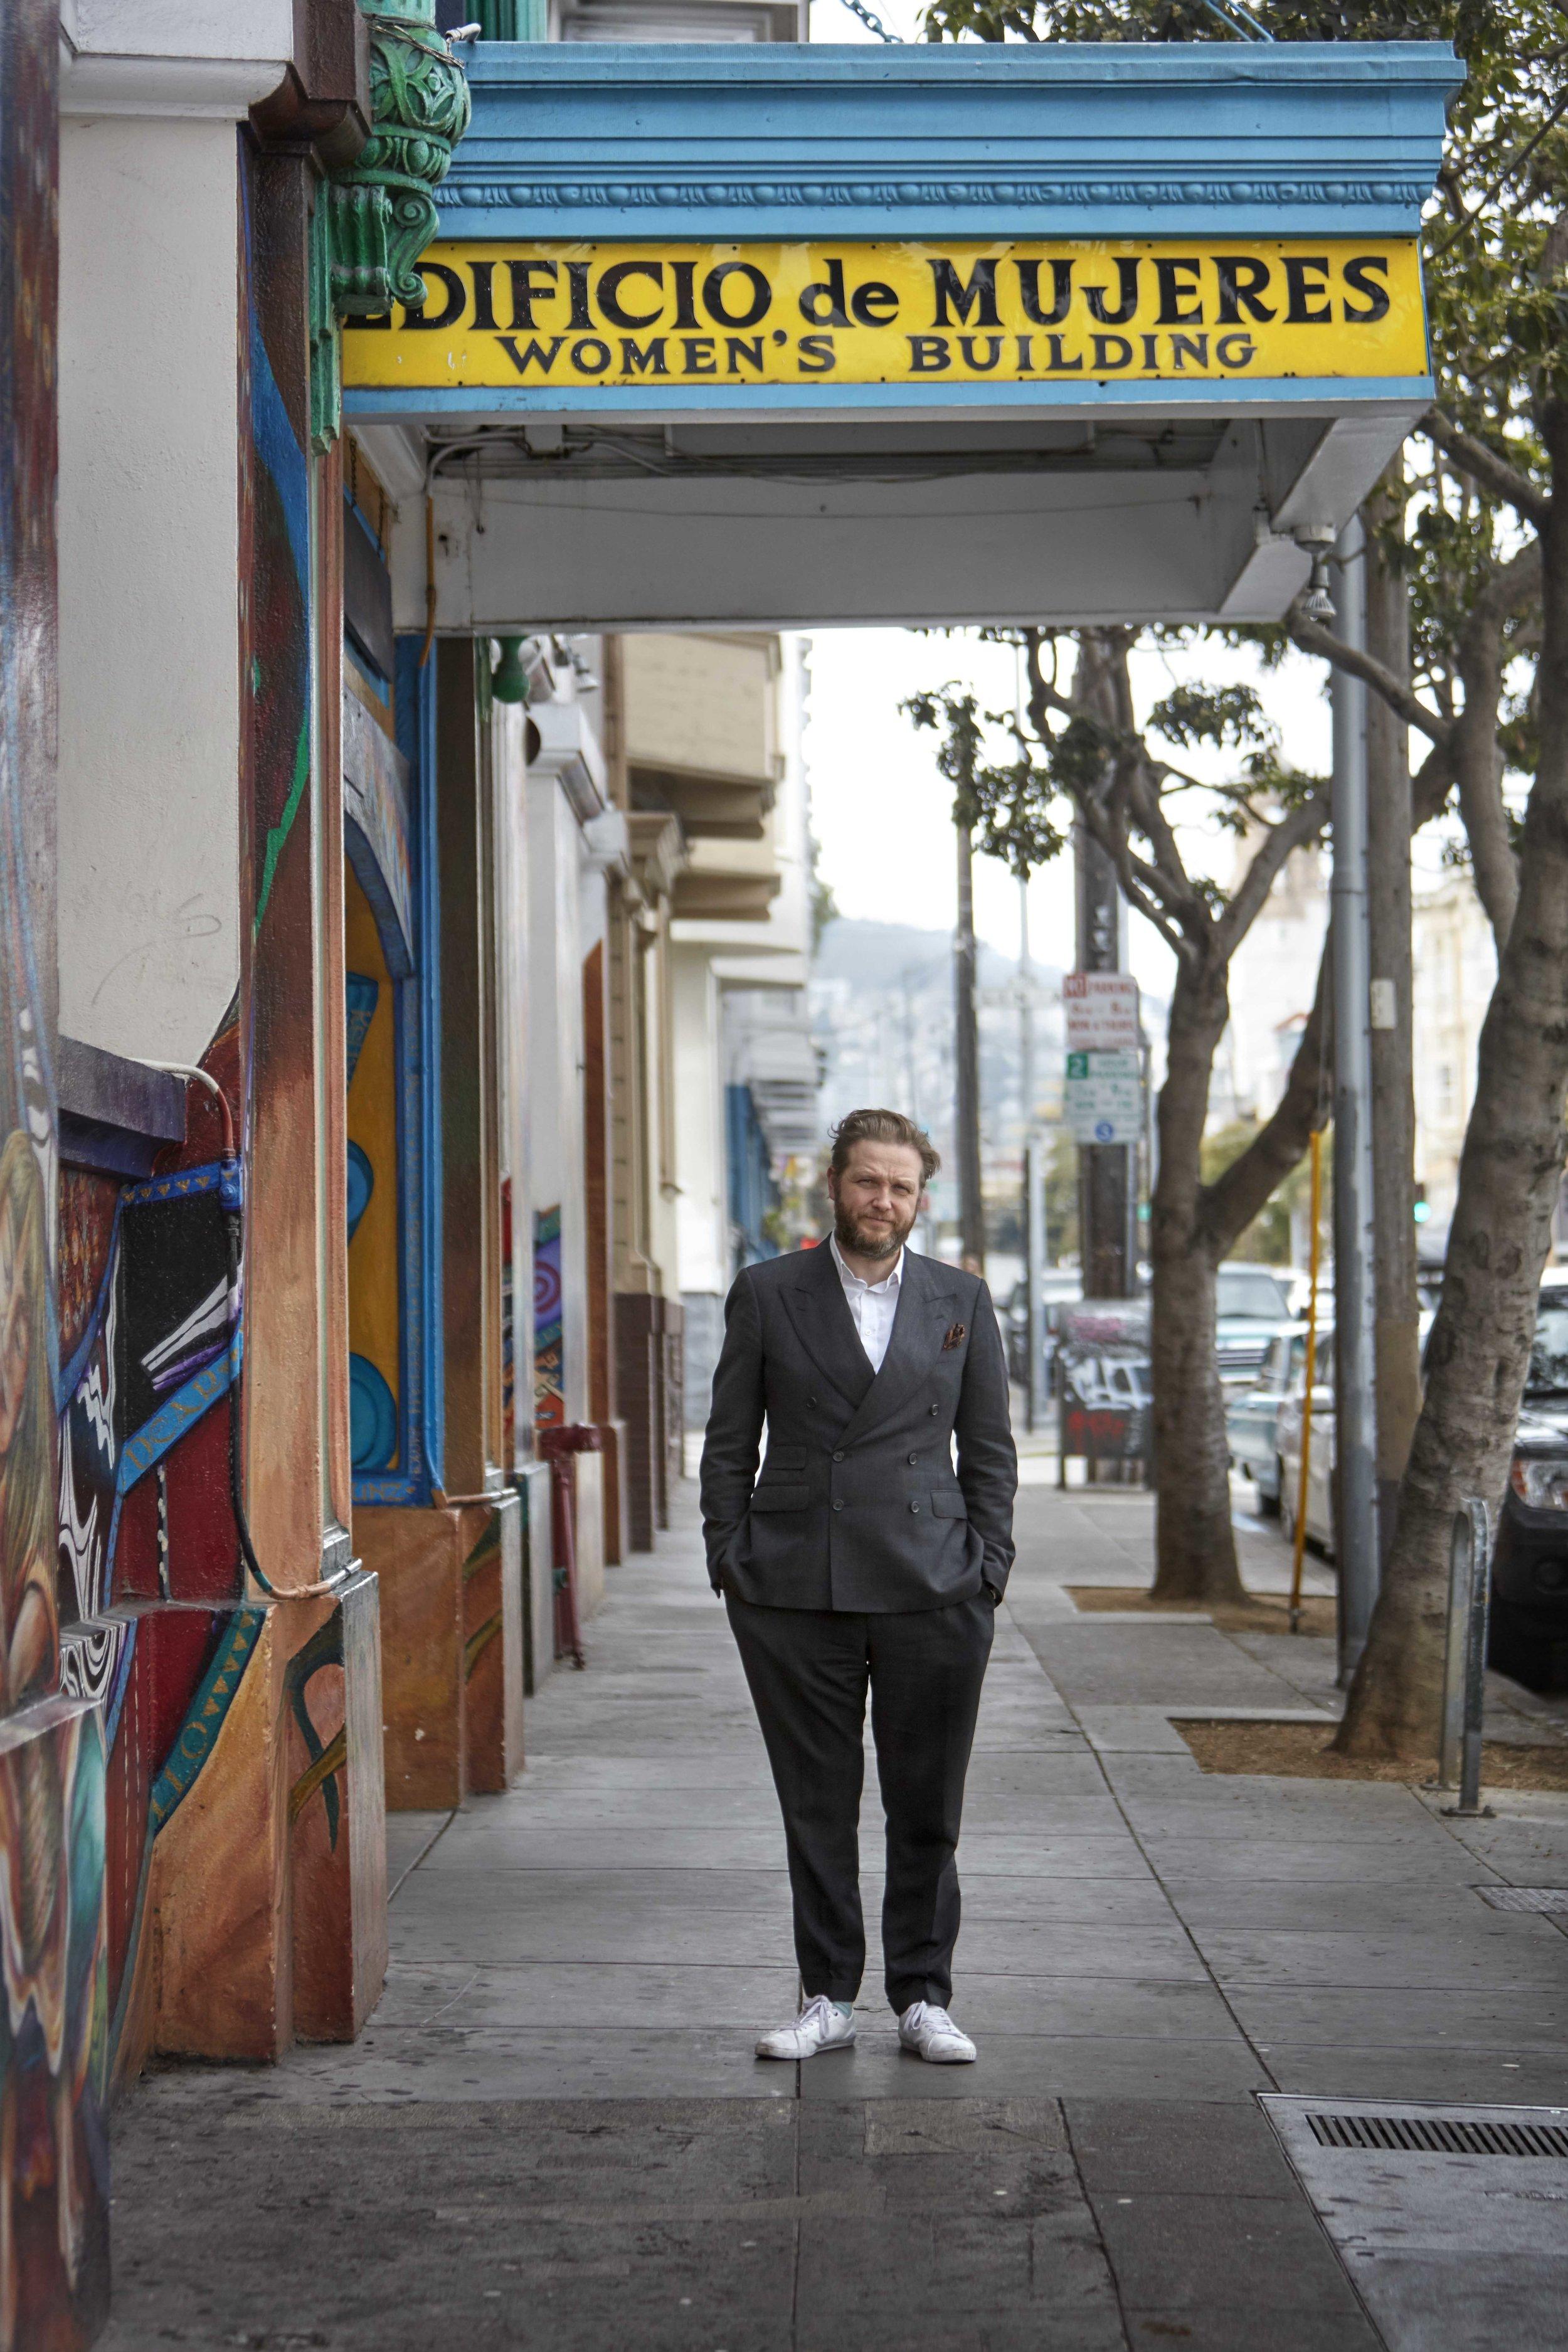 MAESTRAPEACE Mural, The San Francisco Women's Building Photograph by Quinn Gravier